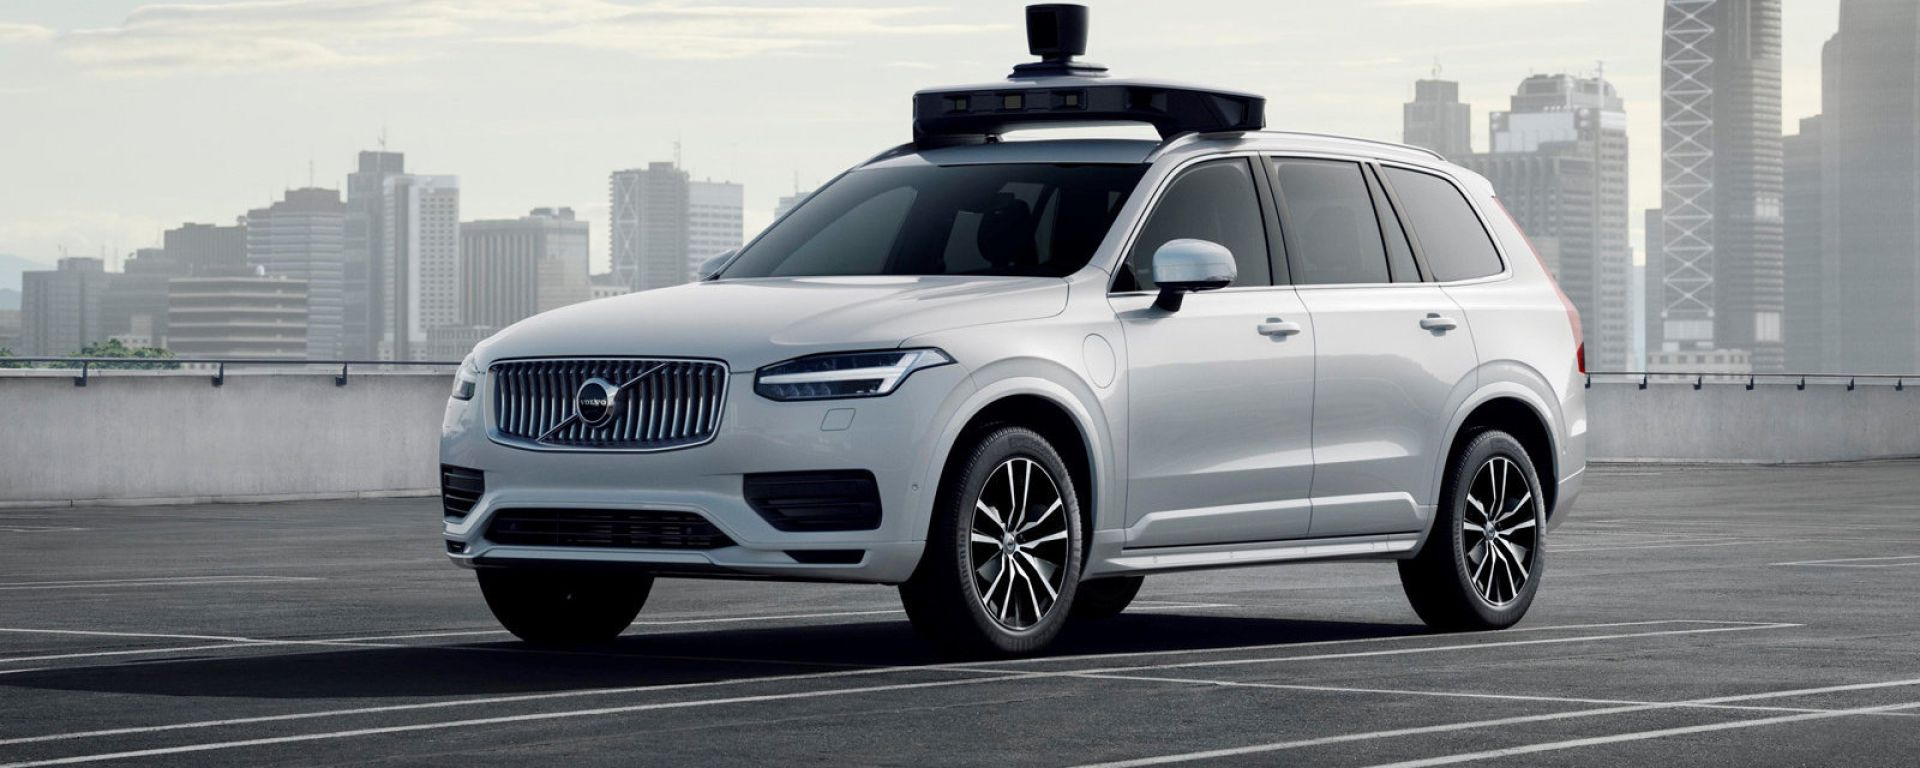 Volvo XC90 taxi per Uber